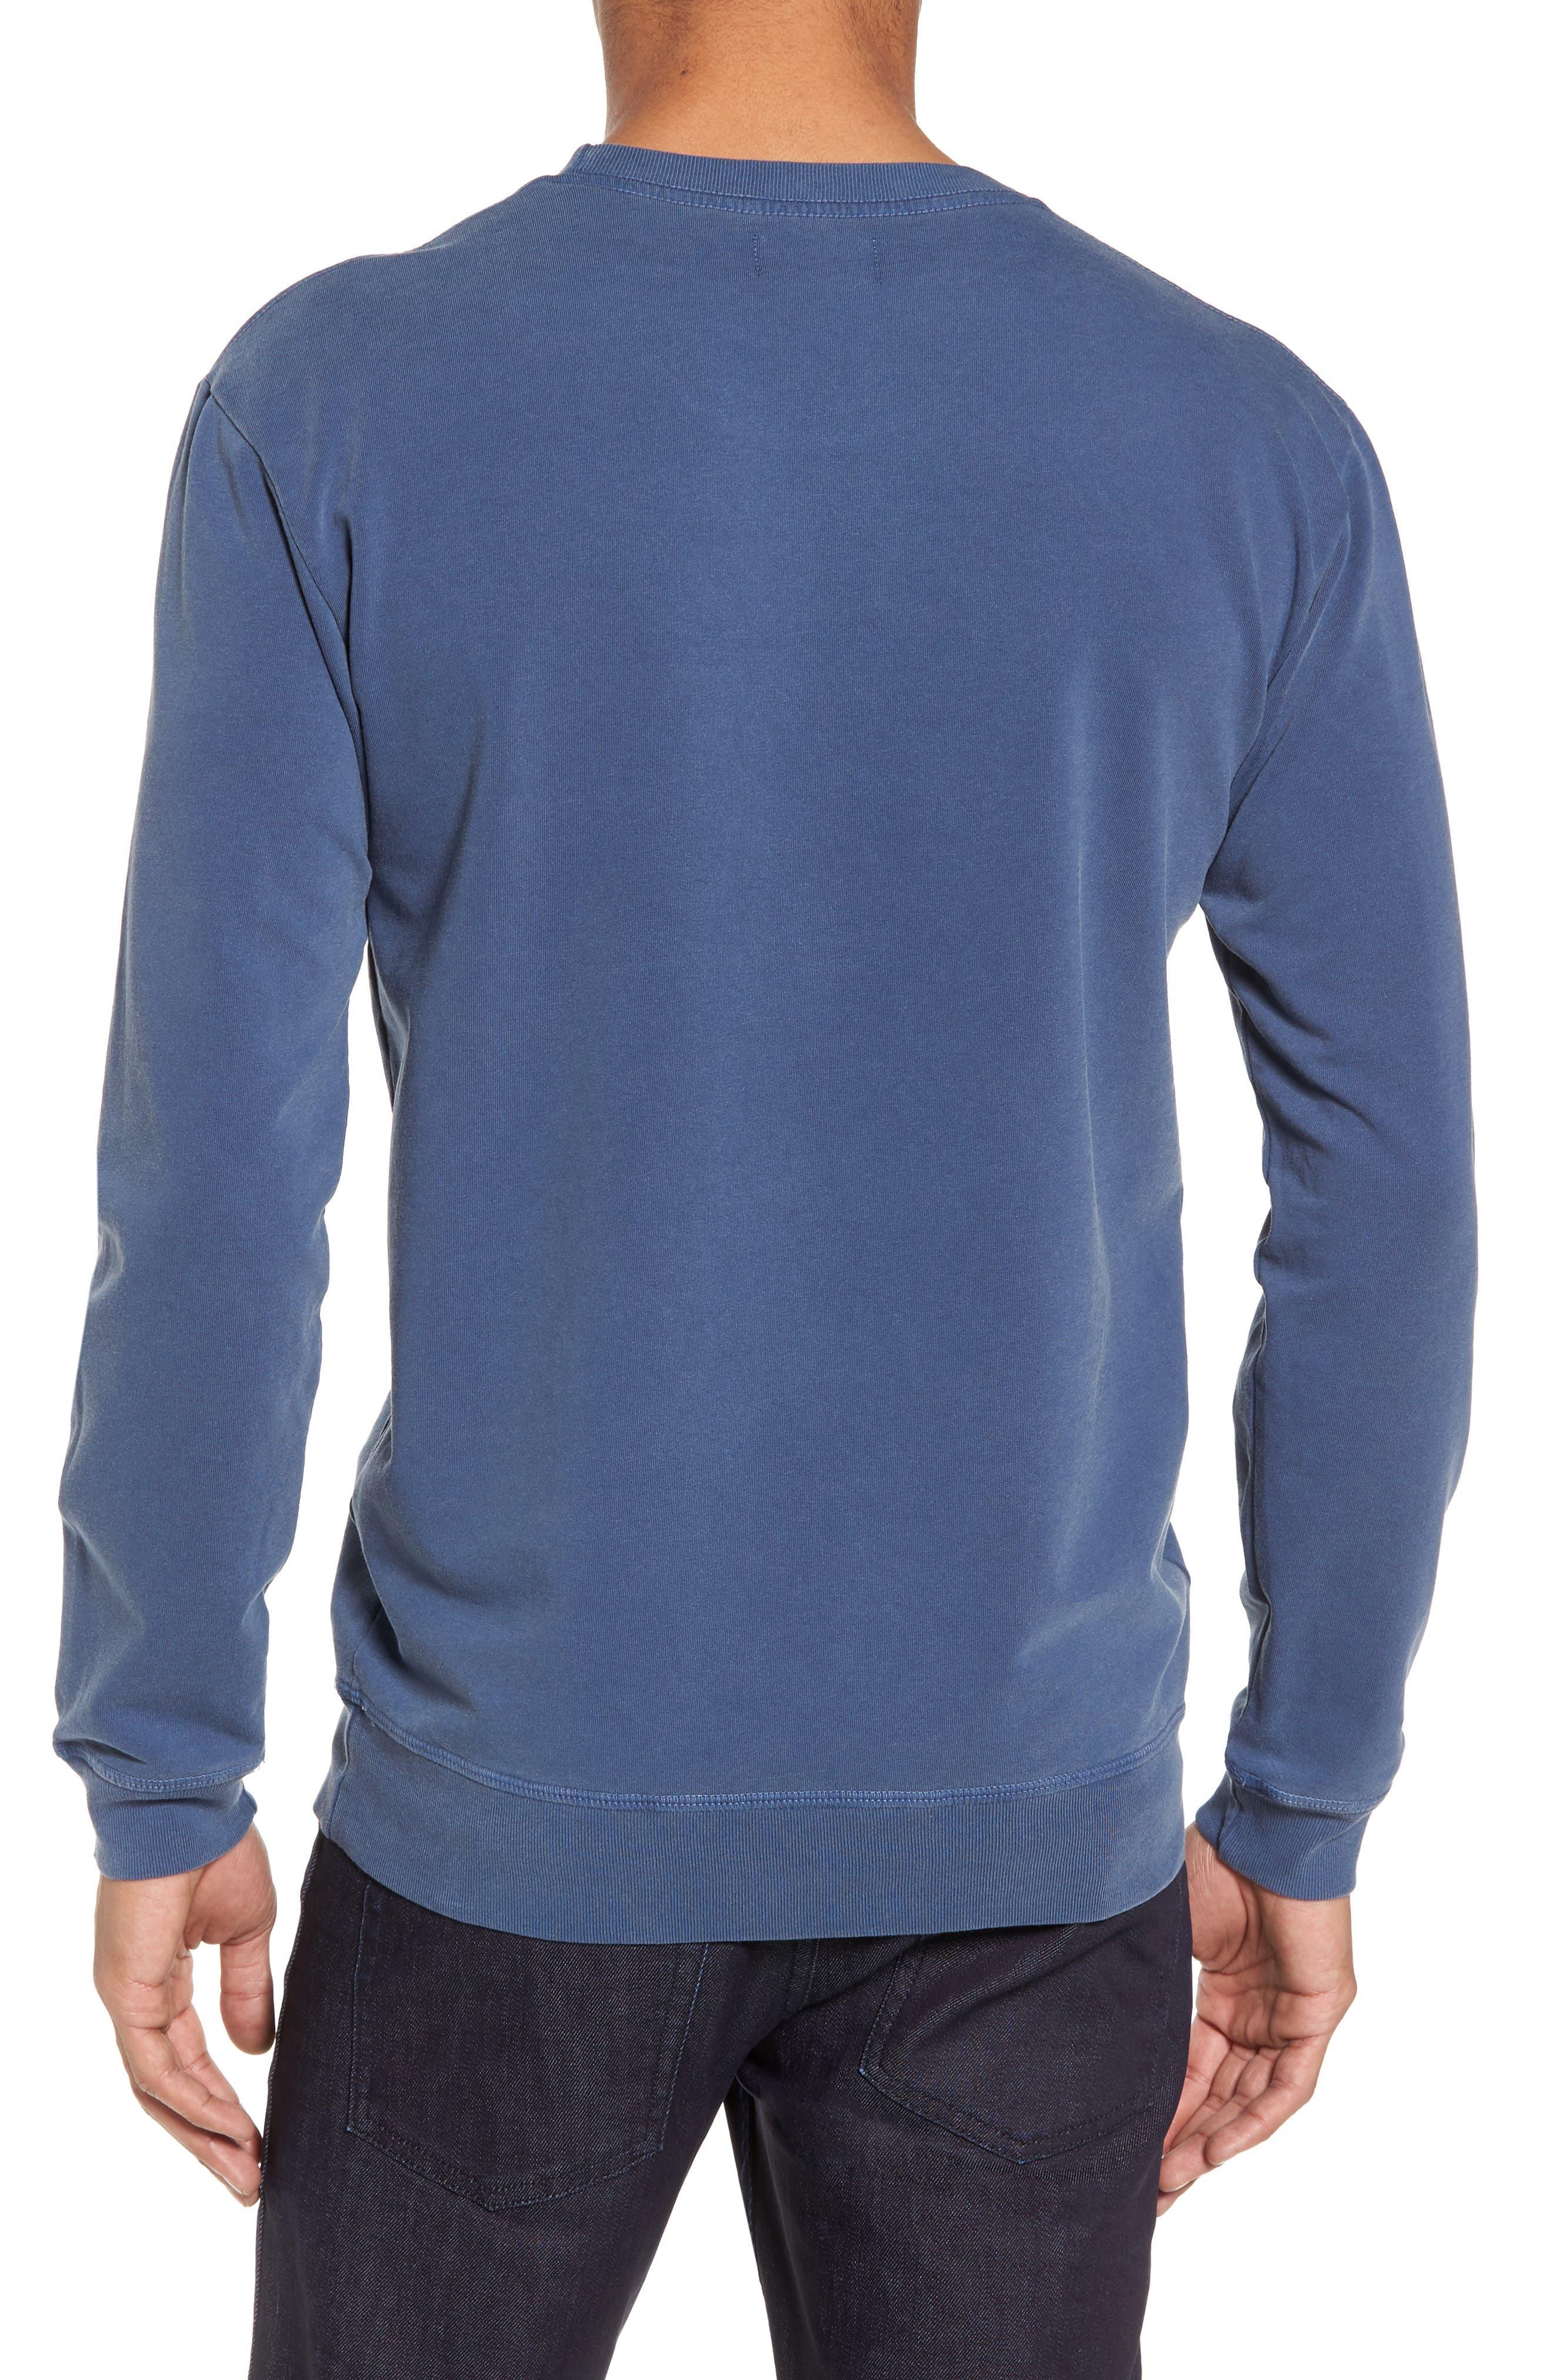 GOODLIFE, Slim Fit Crewneck Sweatshirt, Alternate thumbnail 2, color, FADED NAVY